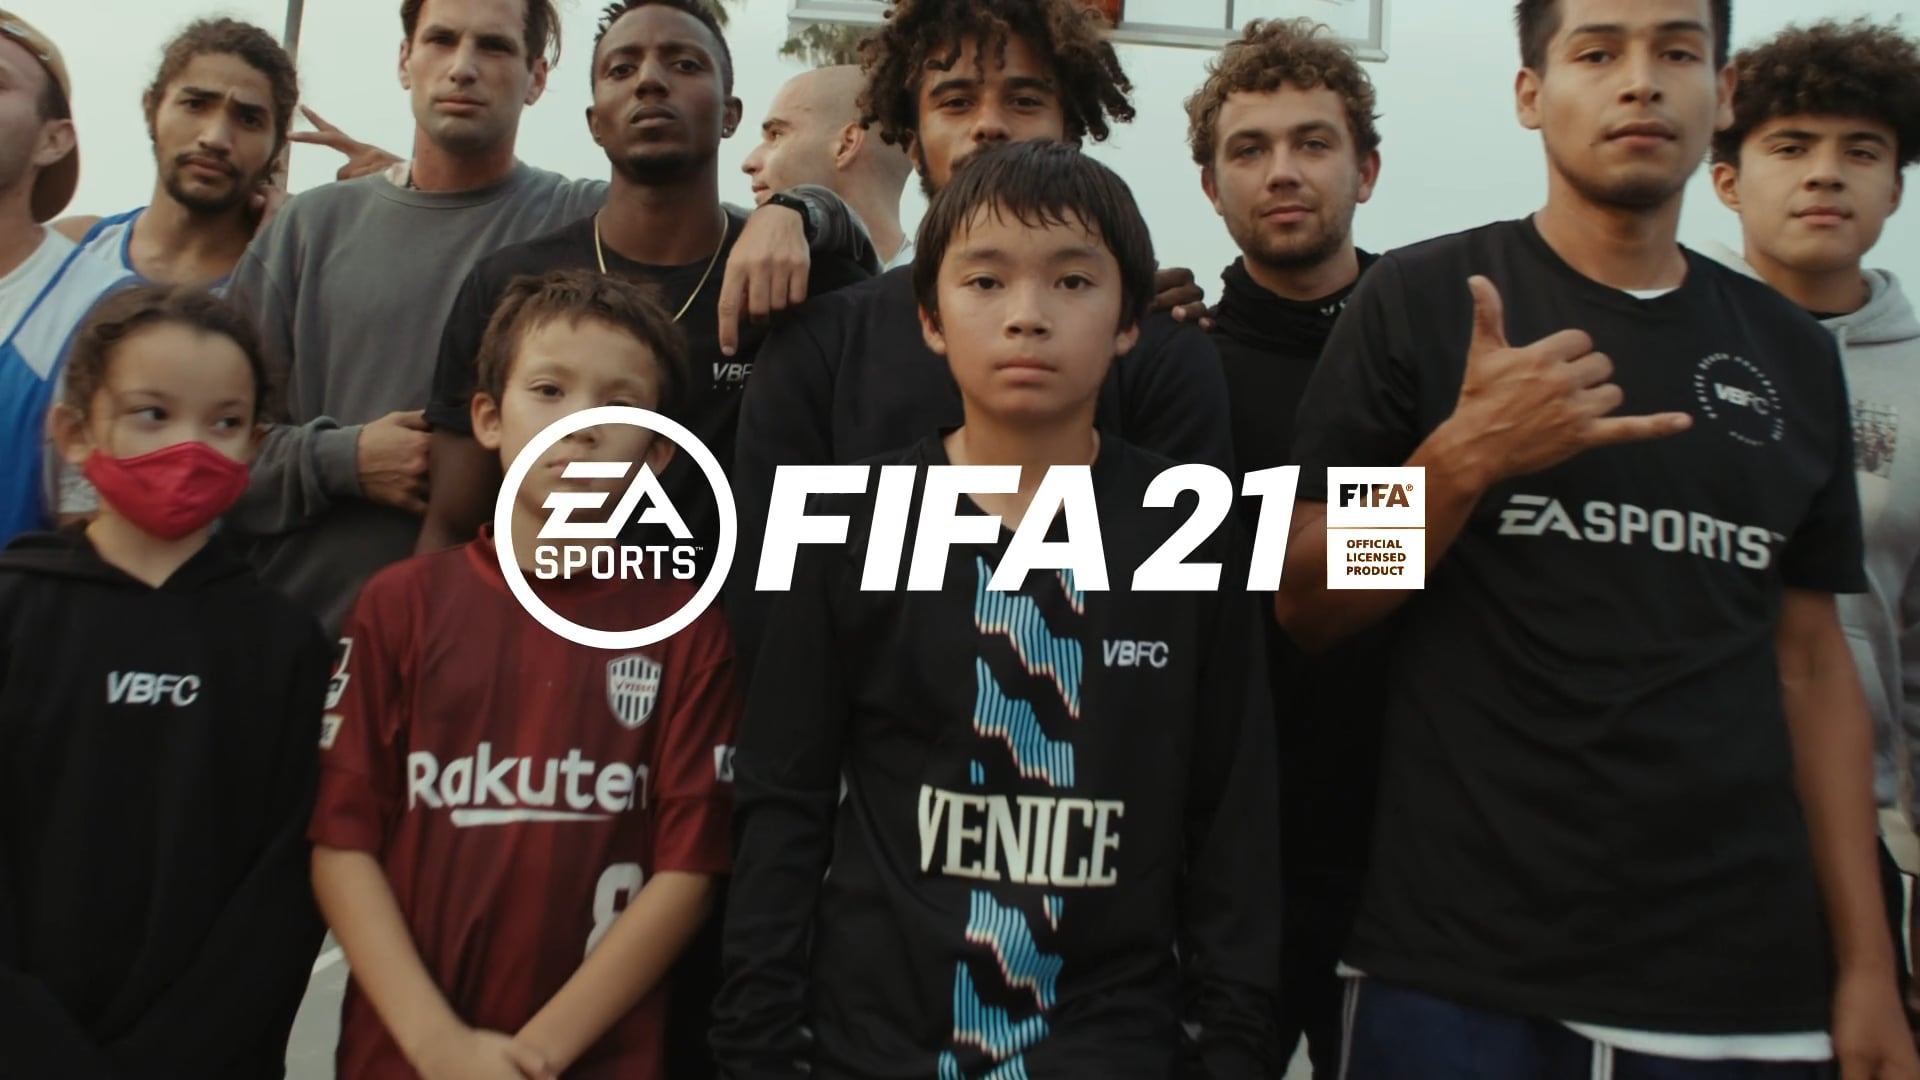 FIFA :: Dreamers